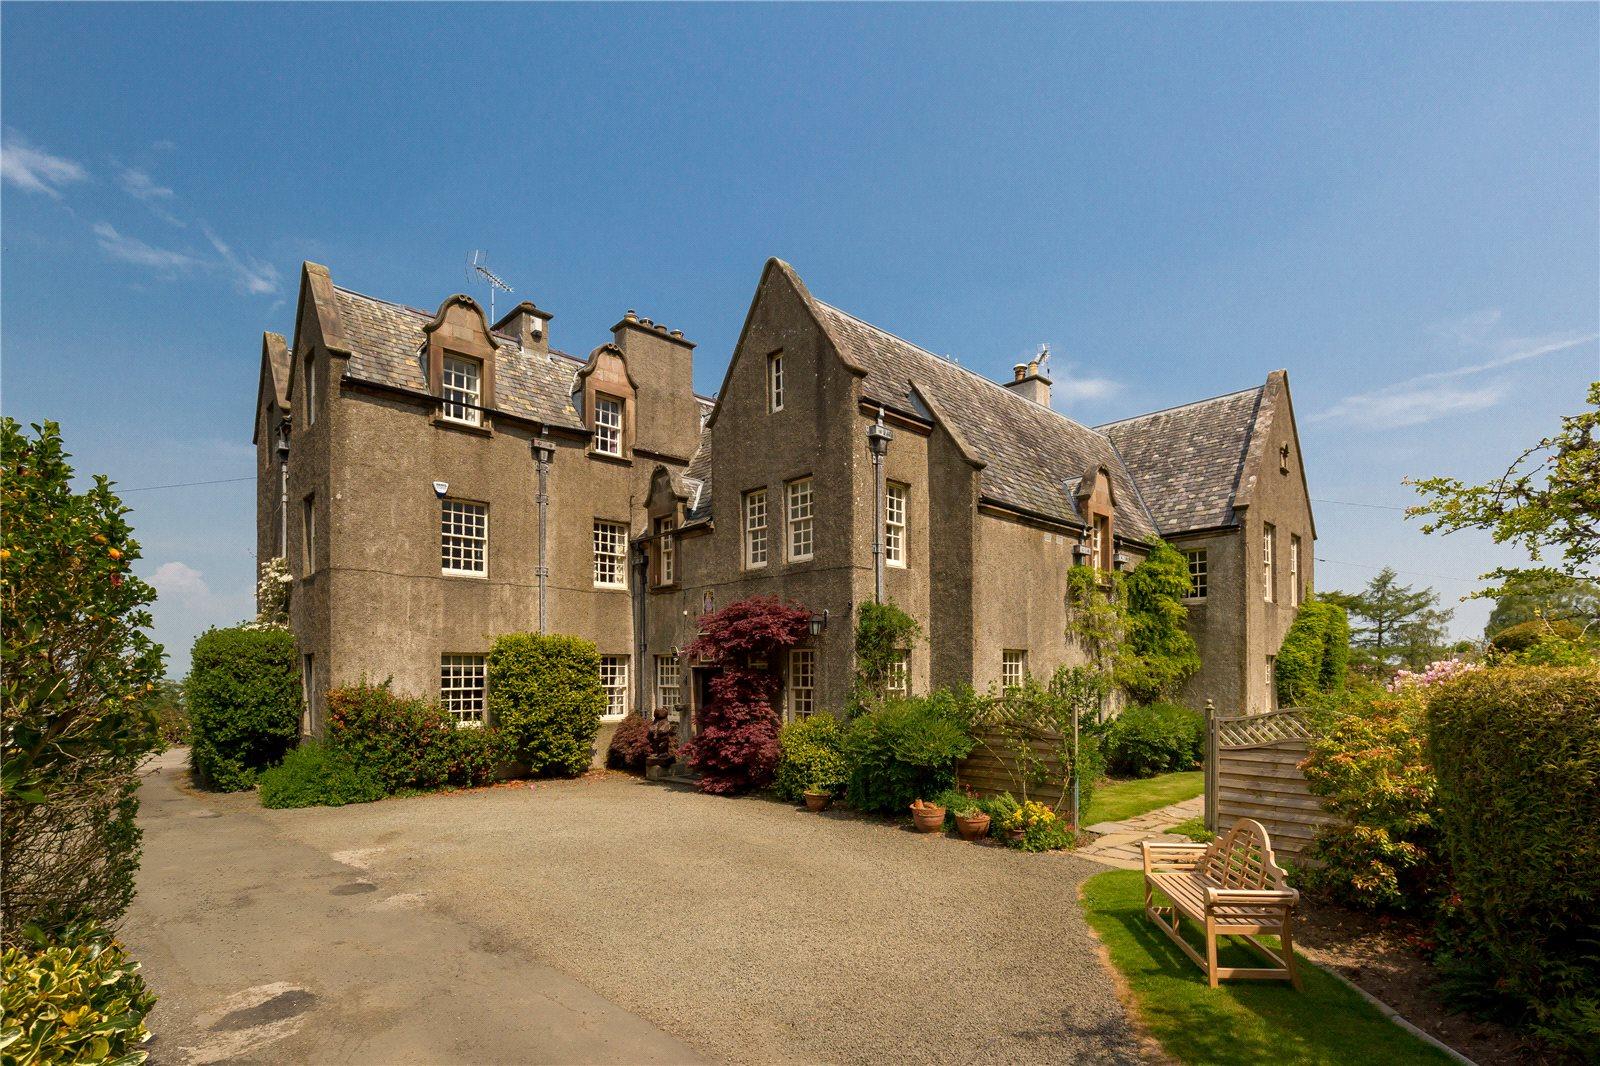 Single Family Home for Sale at 550 Lanark Road West, Balerno, Midlothian, EH14 Midlothian, Scotland